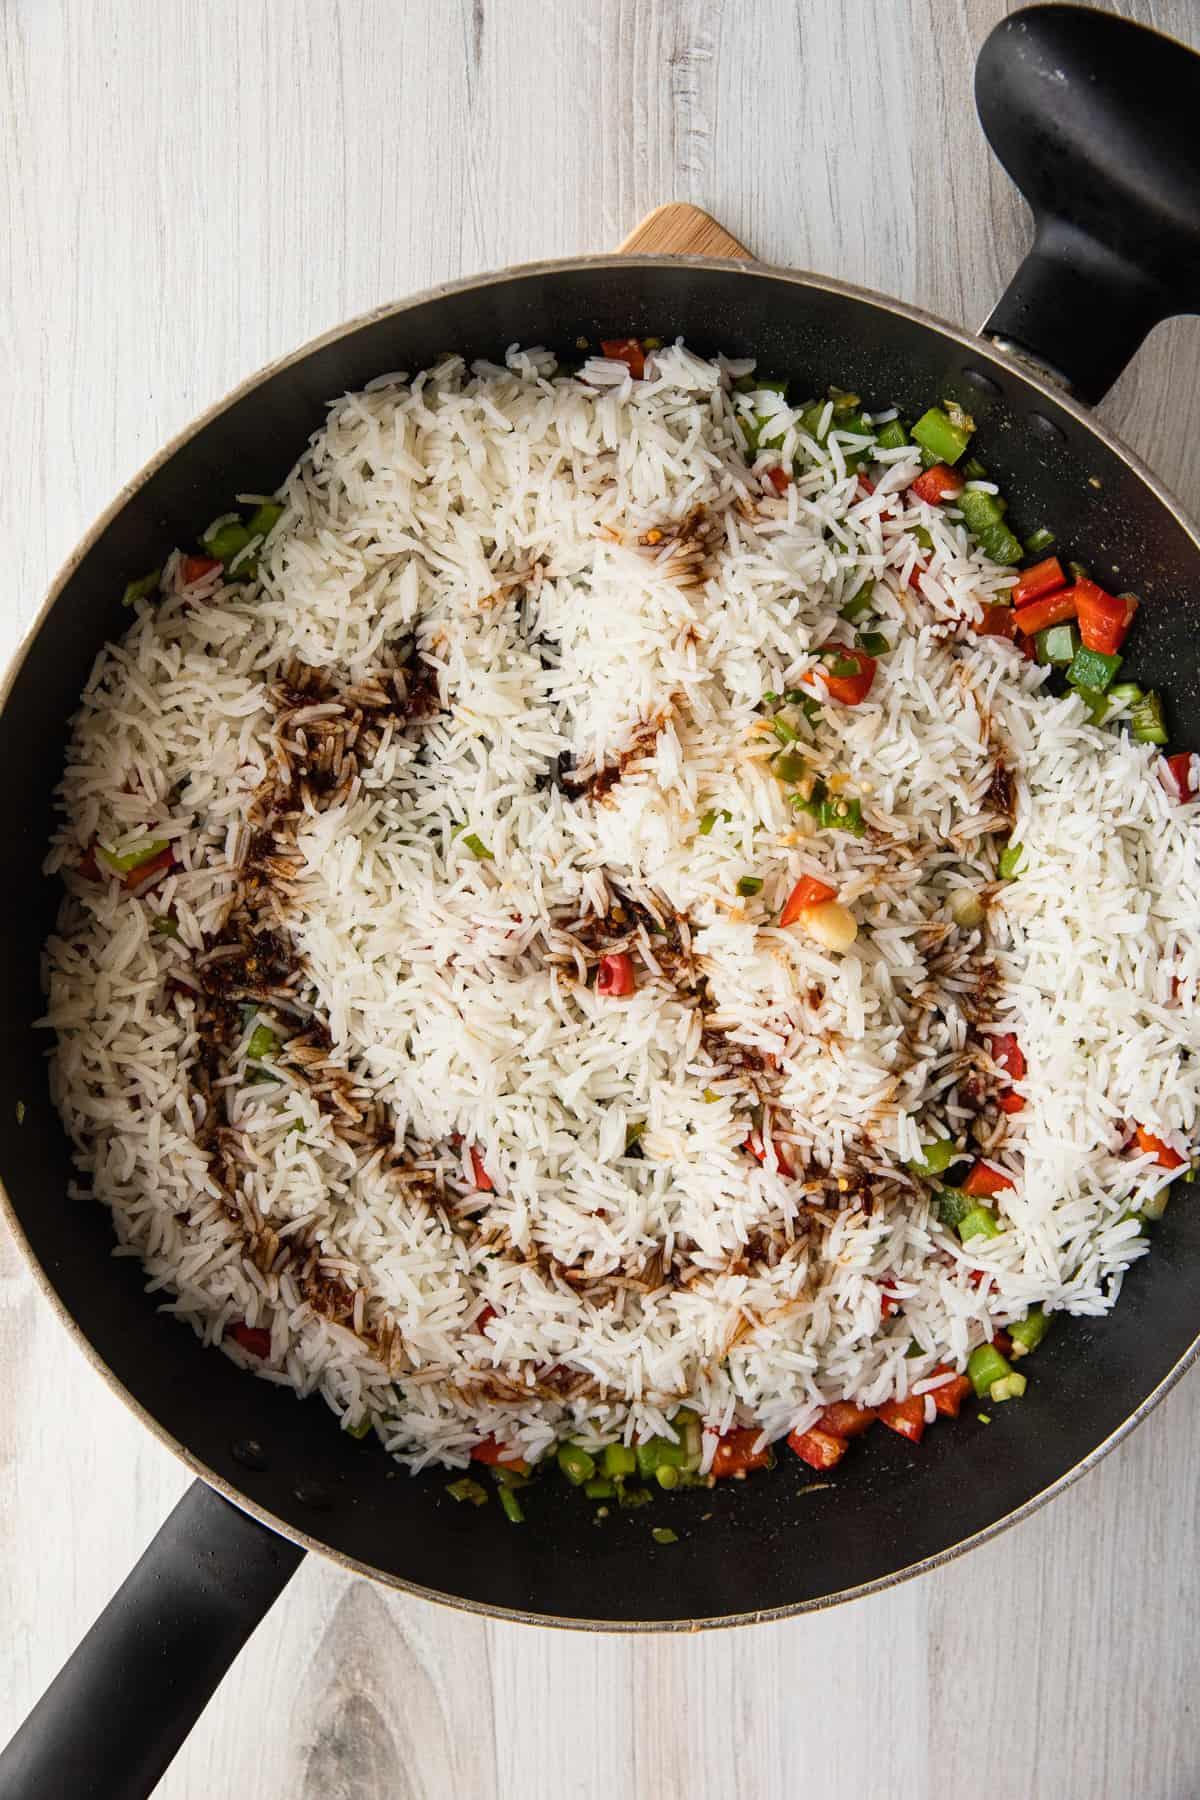 cooking ingredients to make fried rice